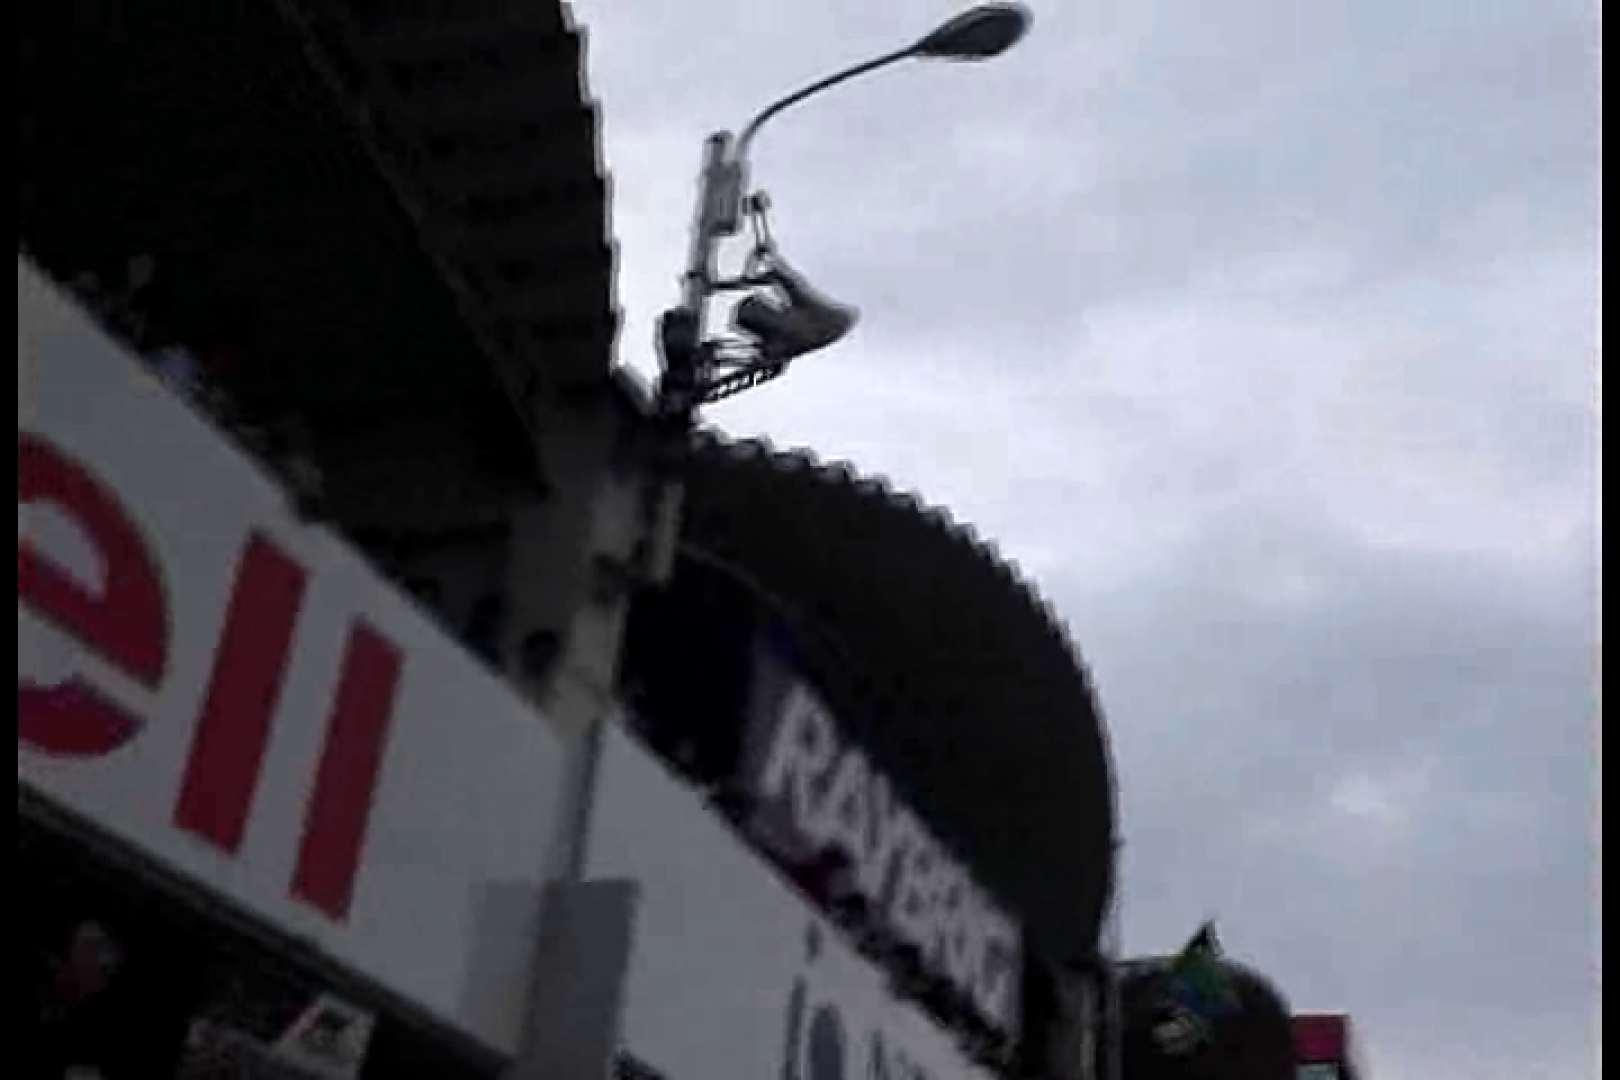 RQカメラ地獄Vol.1 OLエロ画像 盗撮オメコ無修正動画無料 99PICs 42